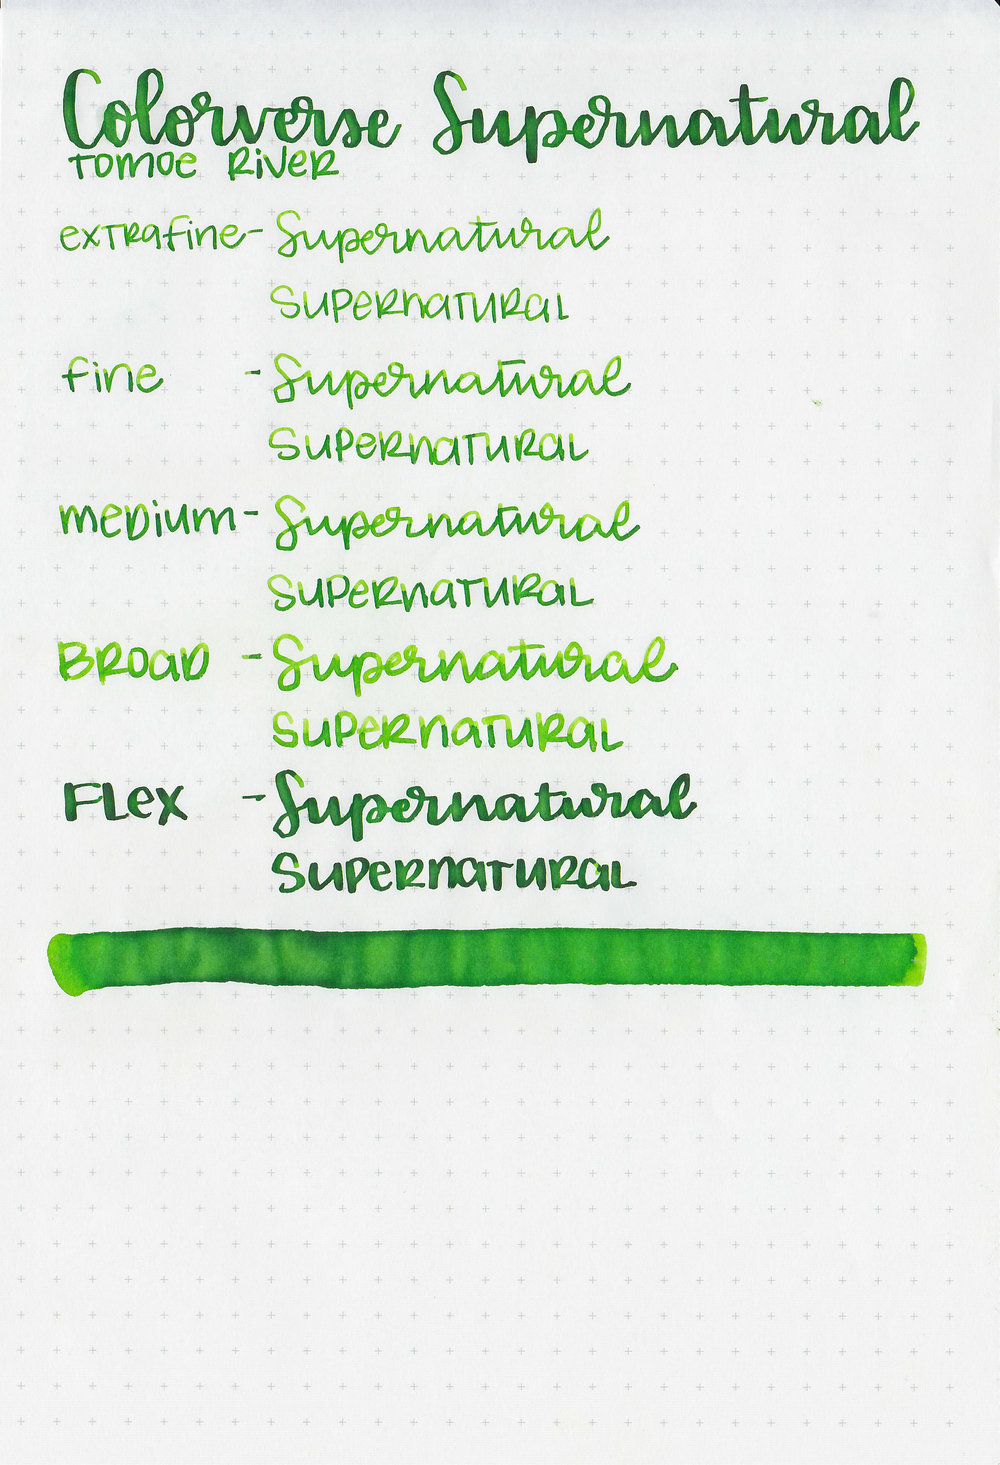 cv-supernatural-7.jpg